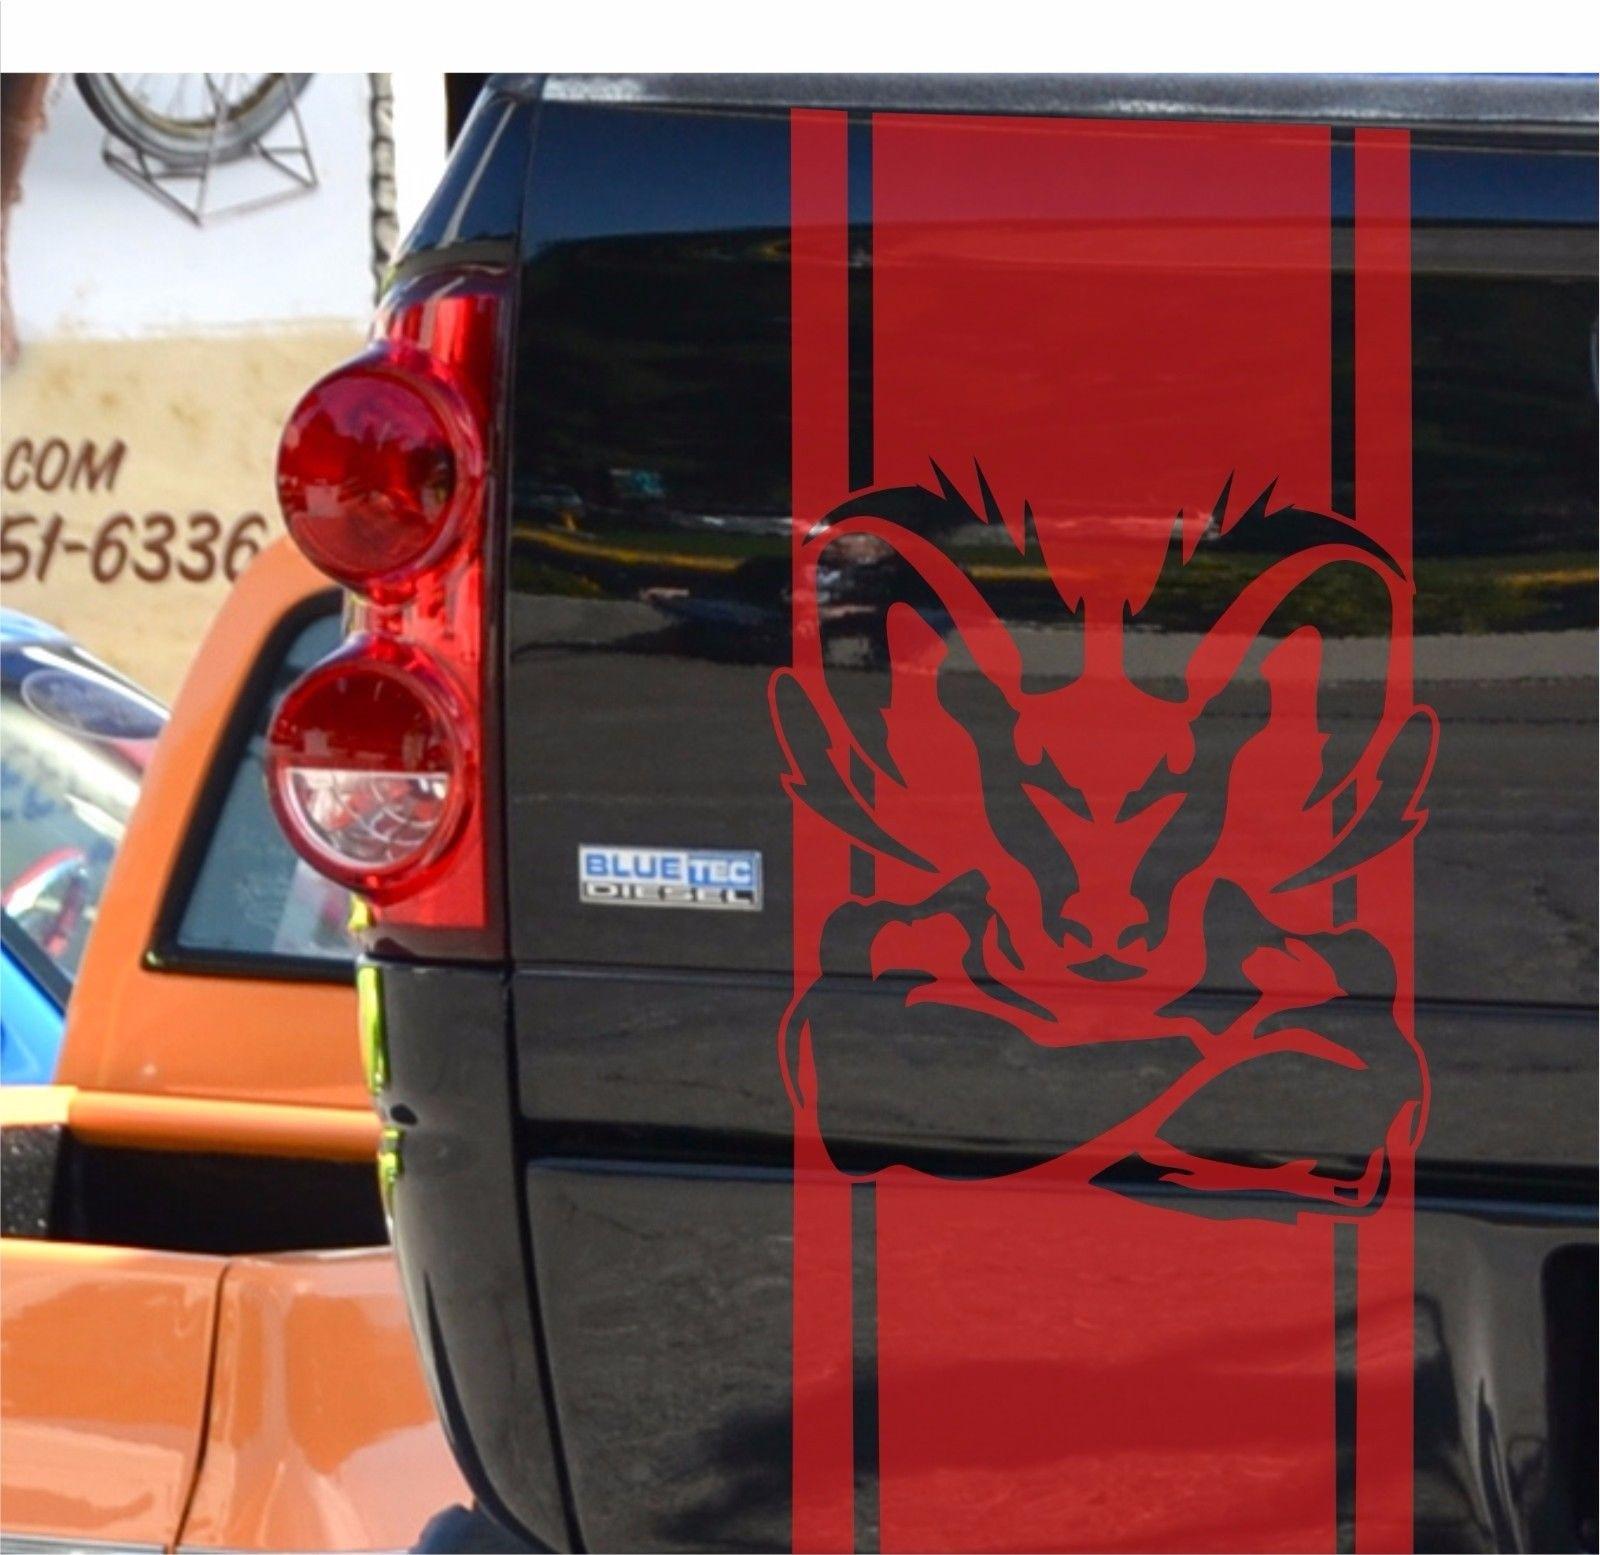 2 Hemi Performance Hood Vinyl Sticker Emblem Decals Dodge Ram 5 7l V8 1500 Nuntiusbrokers Com